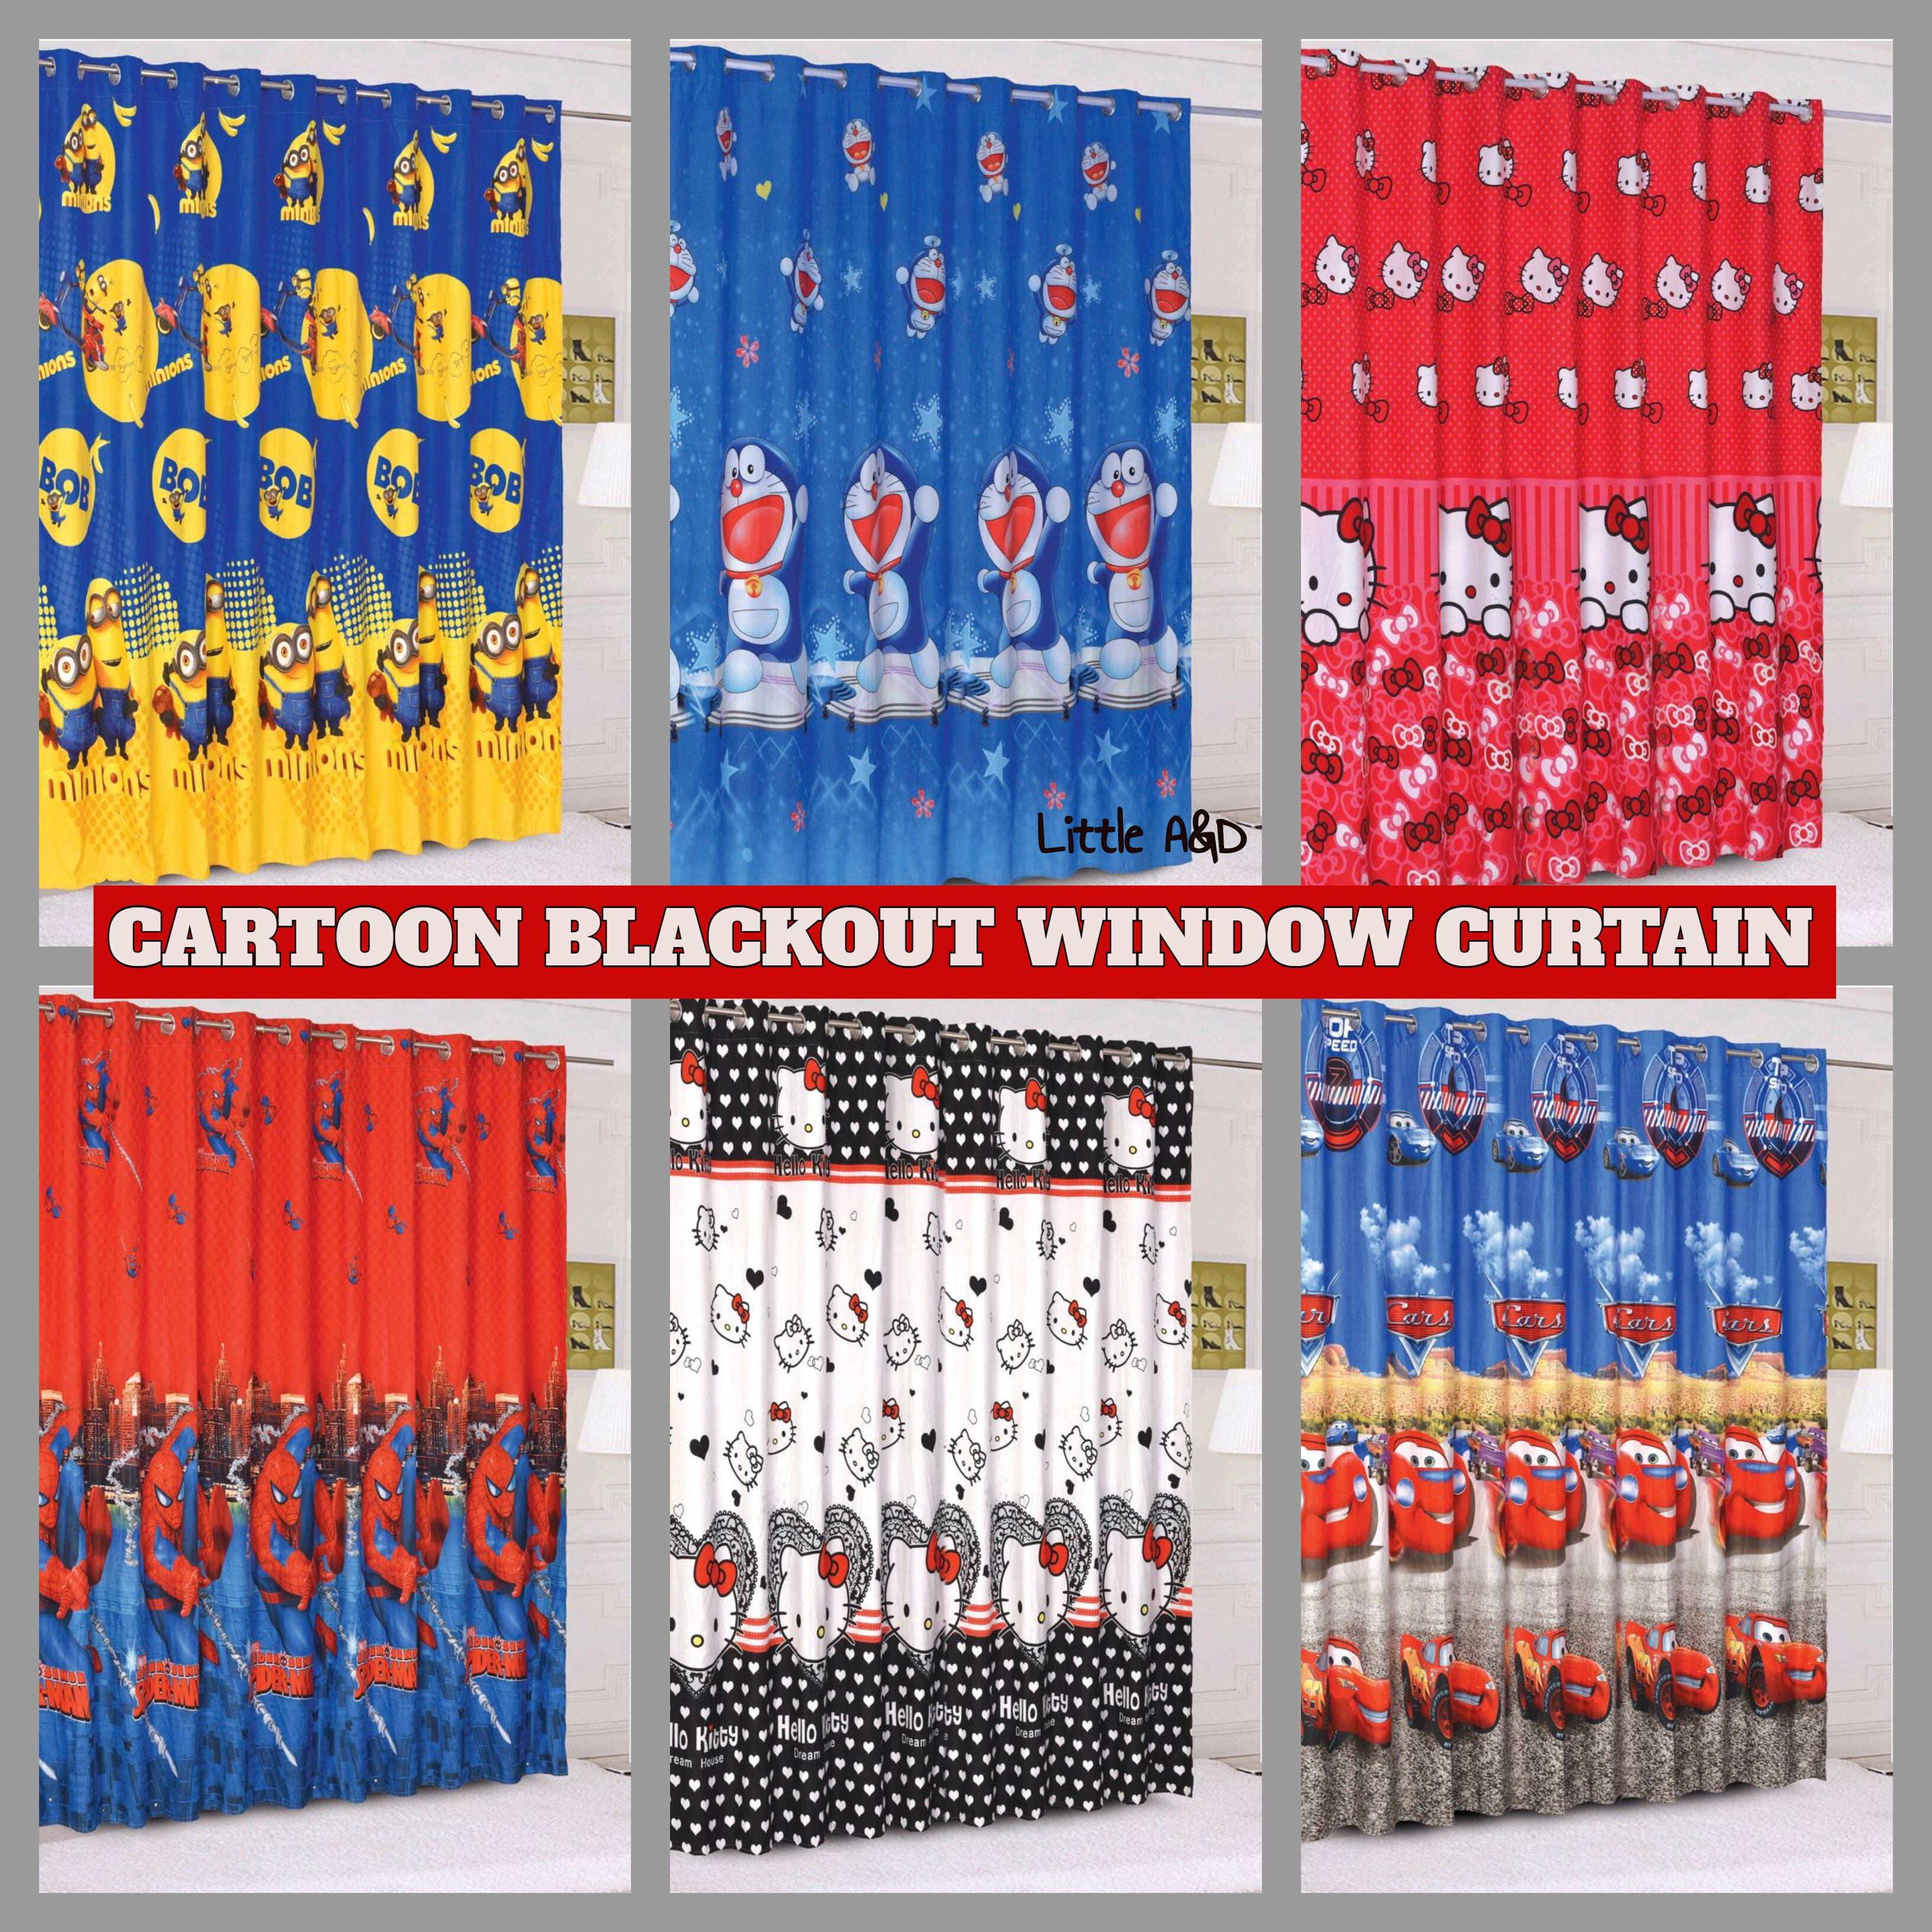 LANGSIR TINGKAP CARTOON KAIN TEBAL CURTAIN WINDOW CARTOON BLACKOUT